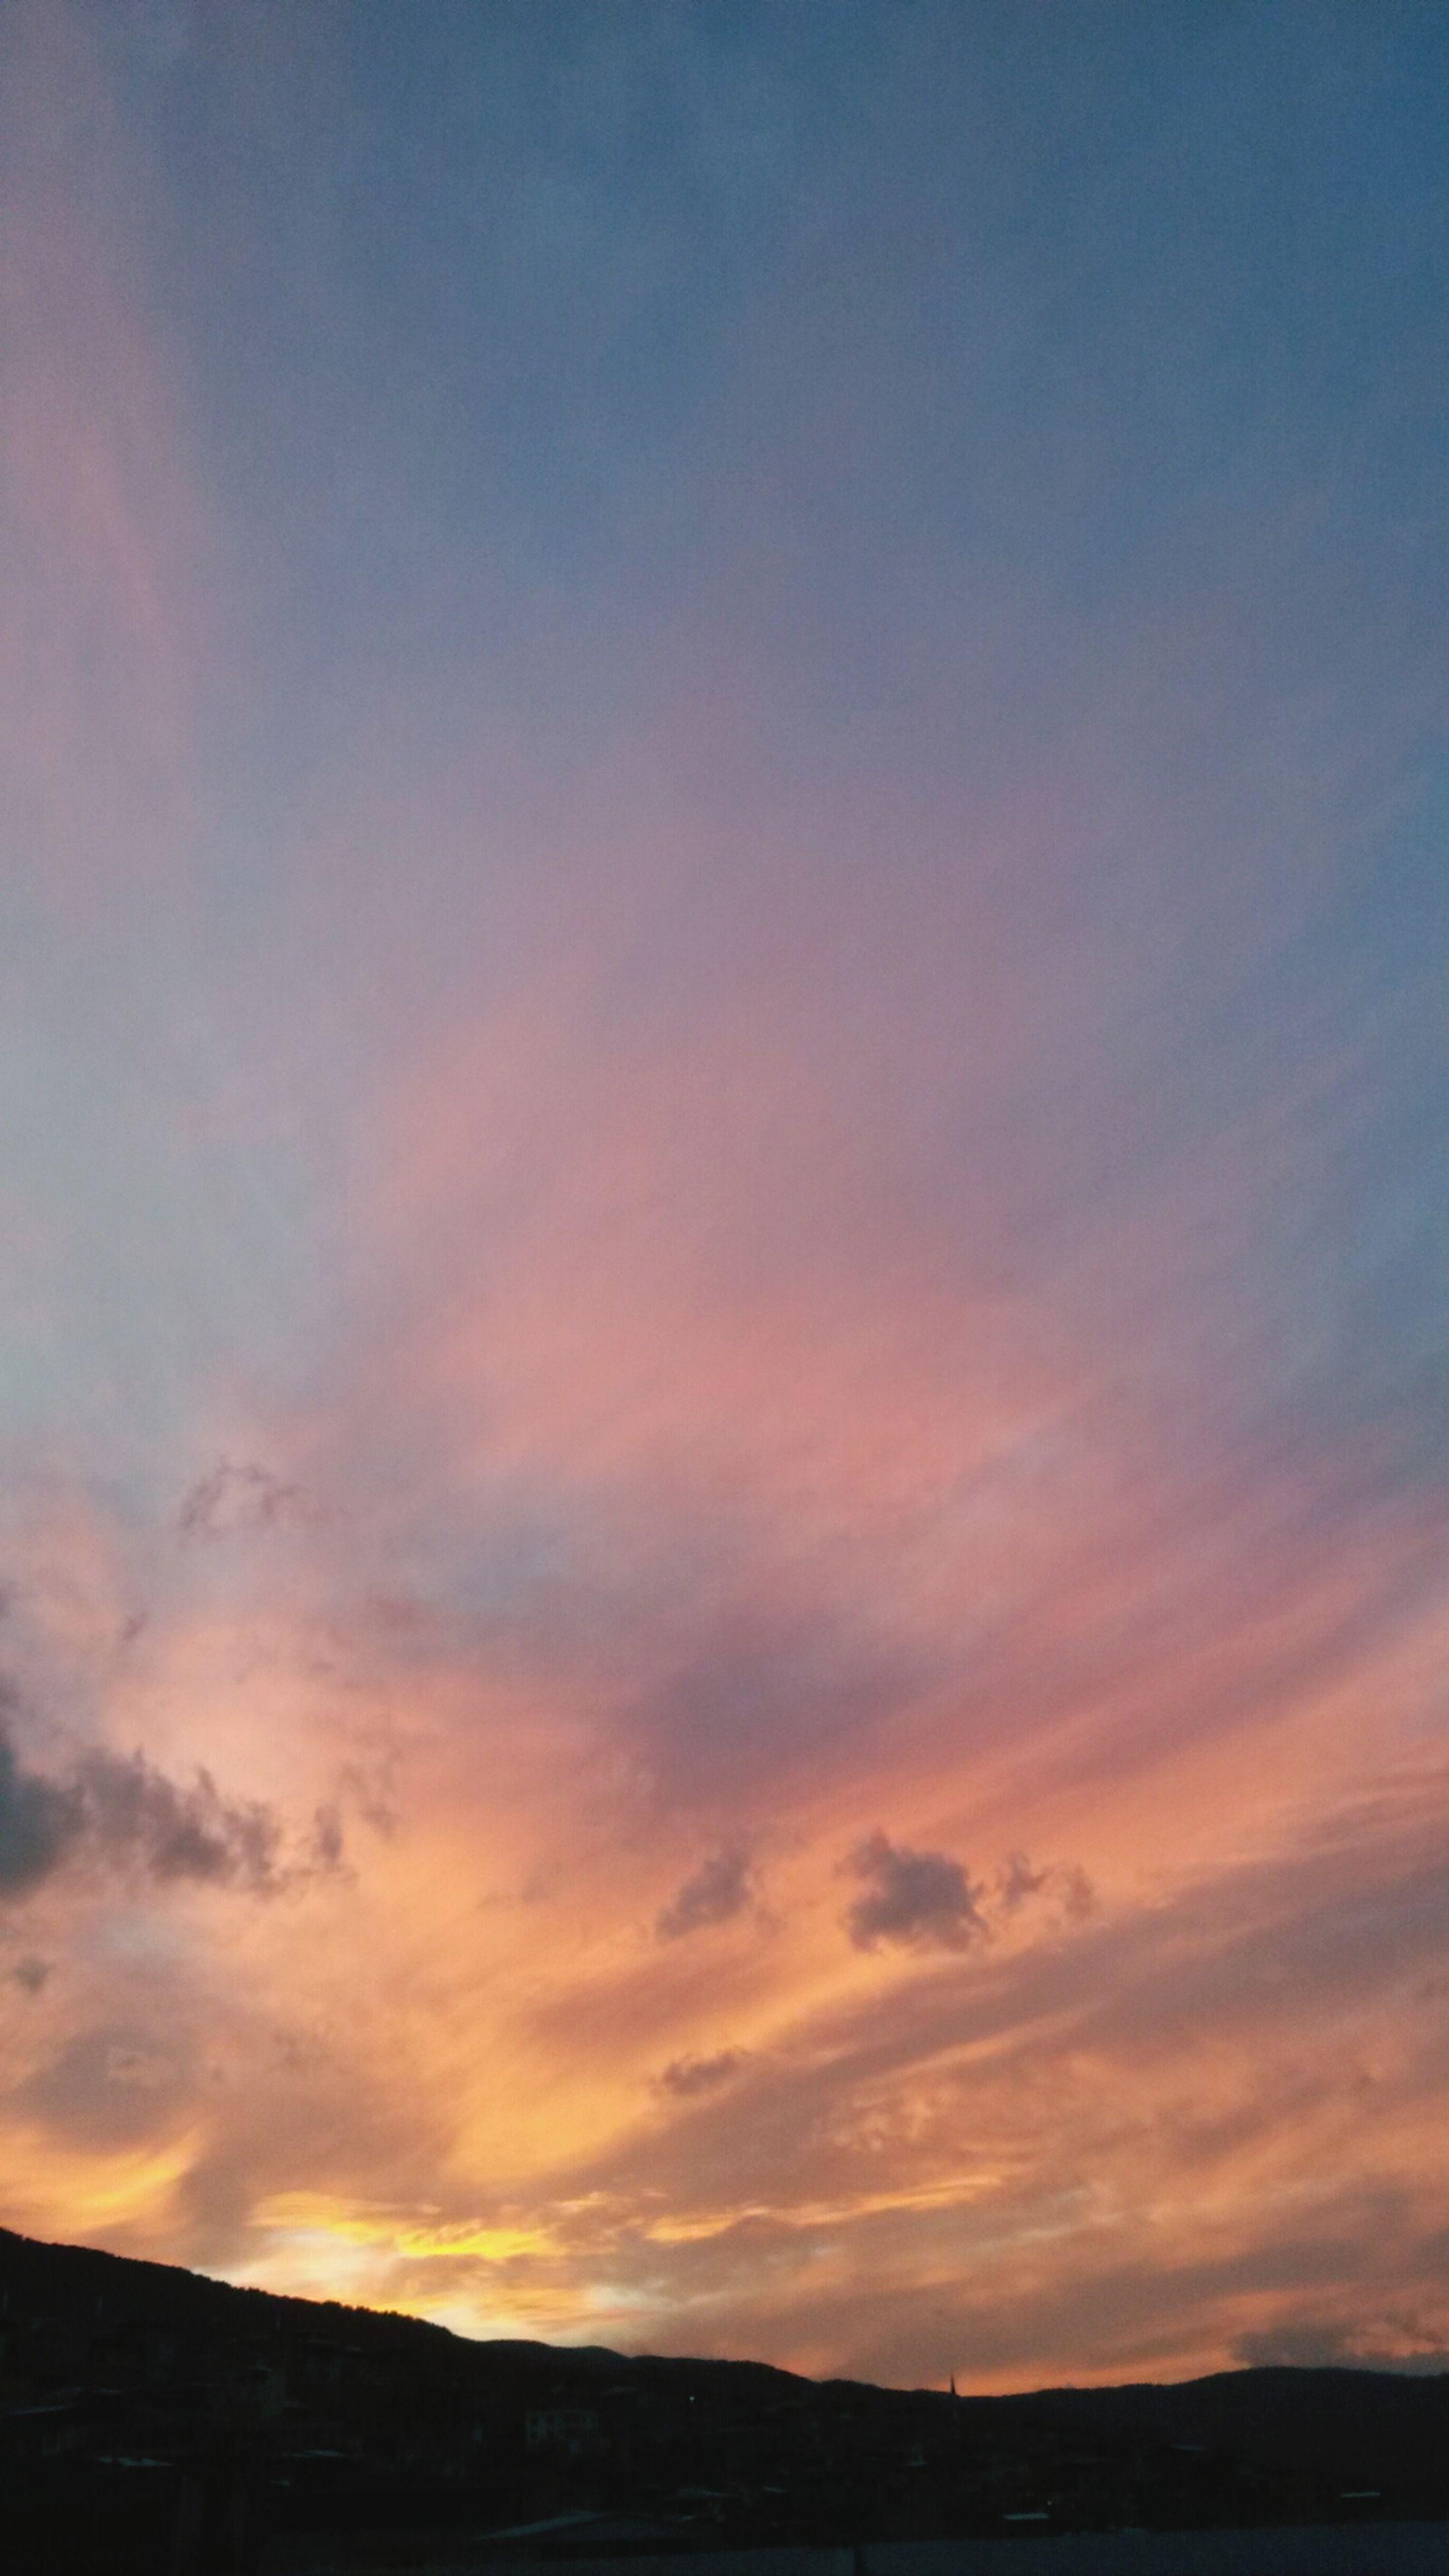 sunset, sky, tranquil scene, scenics, tranquility, beauty in nature, silhouette, landscape, cloud - sky, nature, orange color, idyllic, cloud, outdoors, dusk, no people, dramatic sky, non-urban scene, field, horizon over land